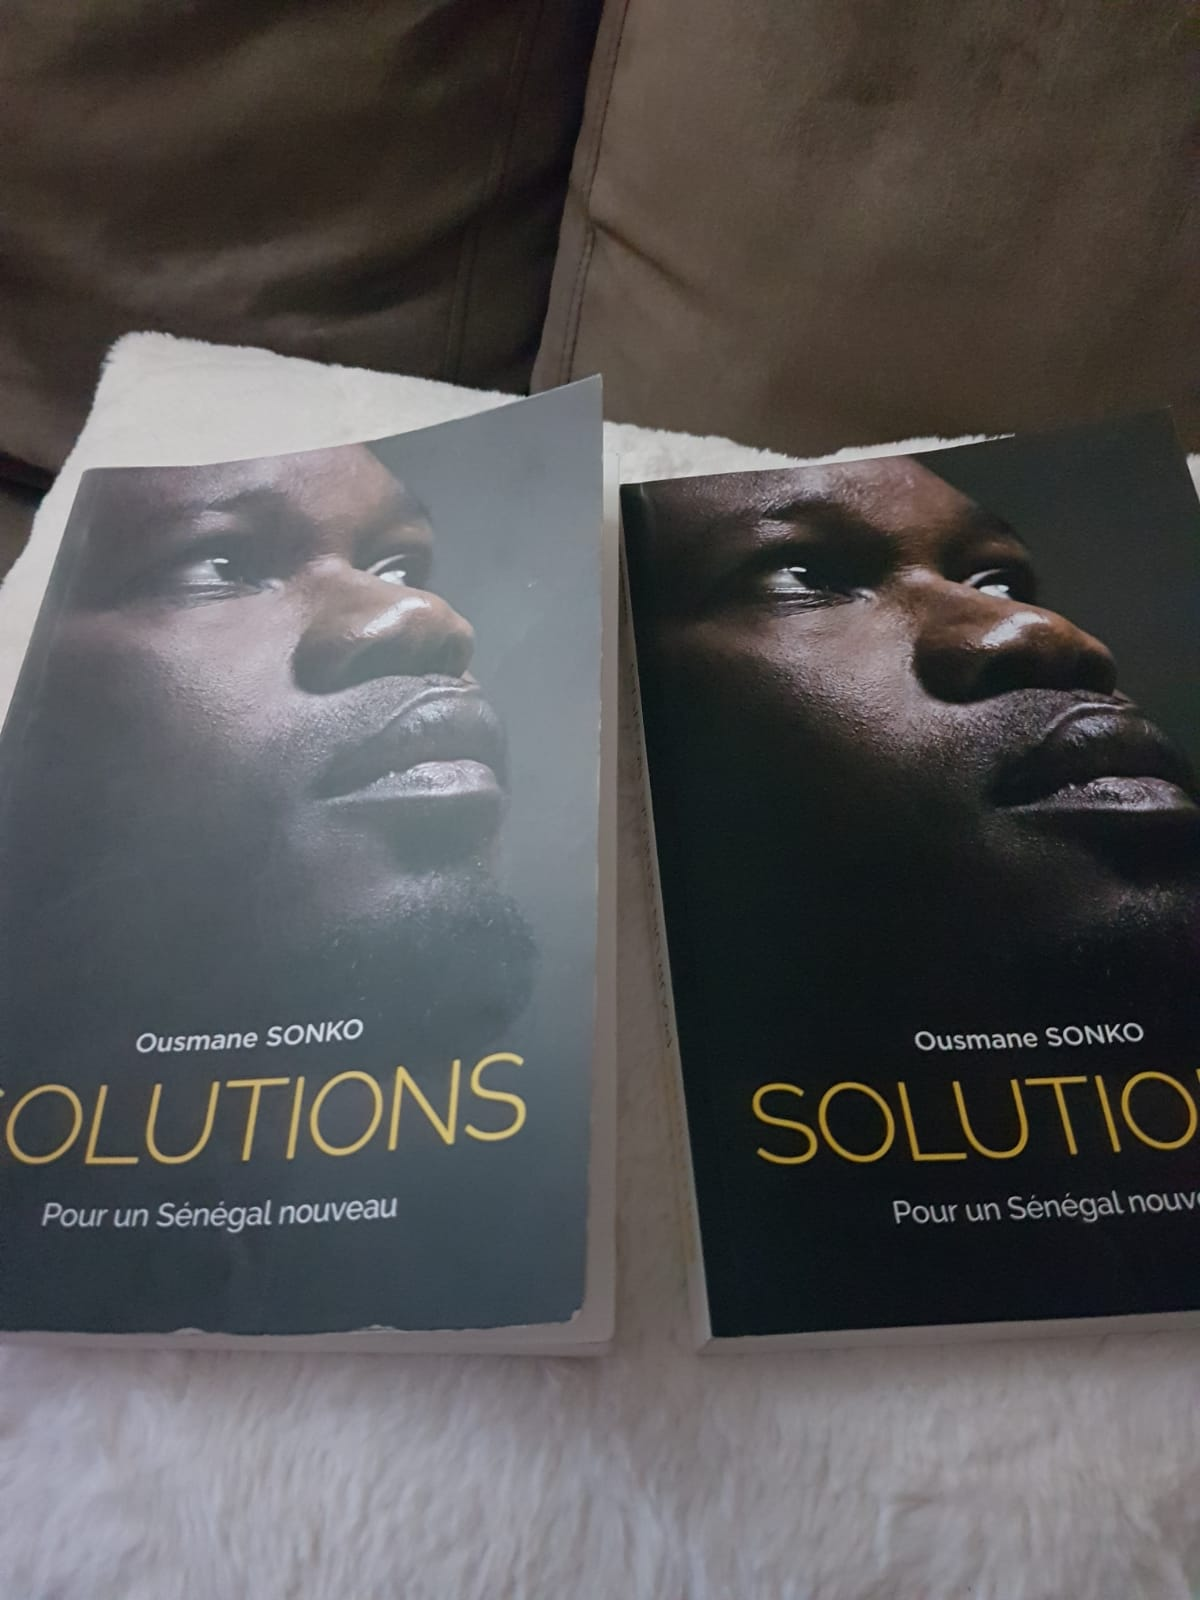 solutions de ousmane sonko